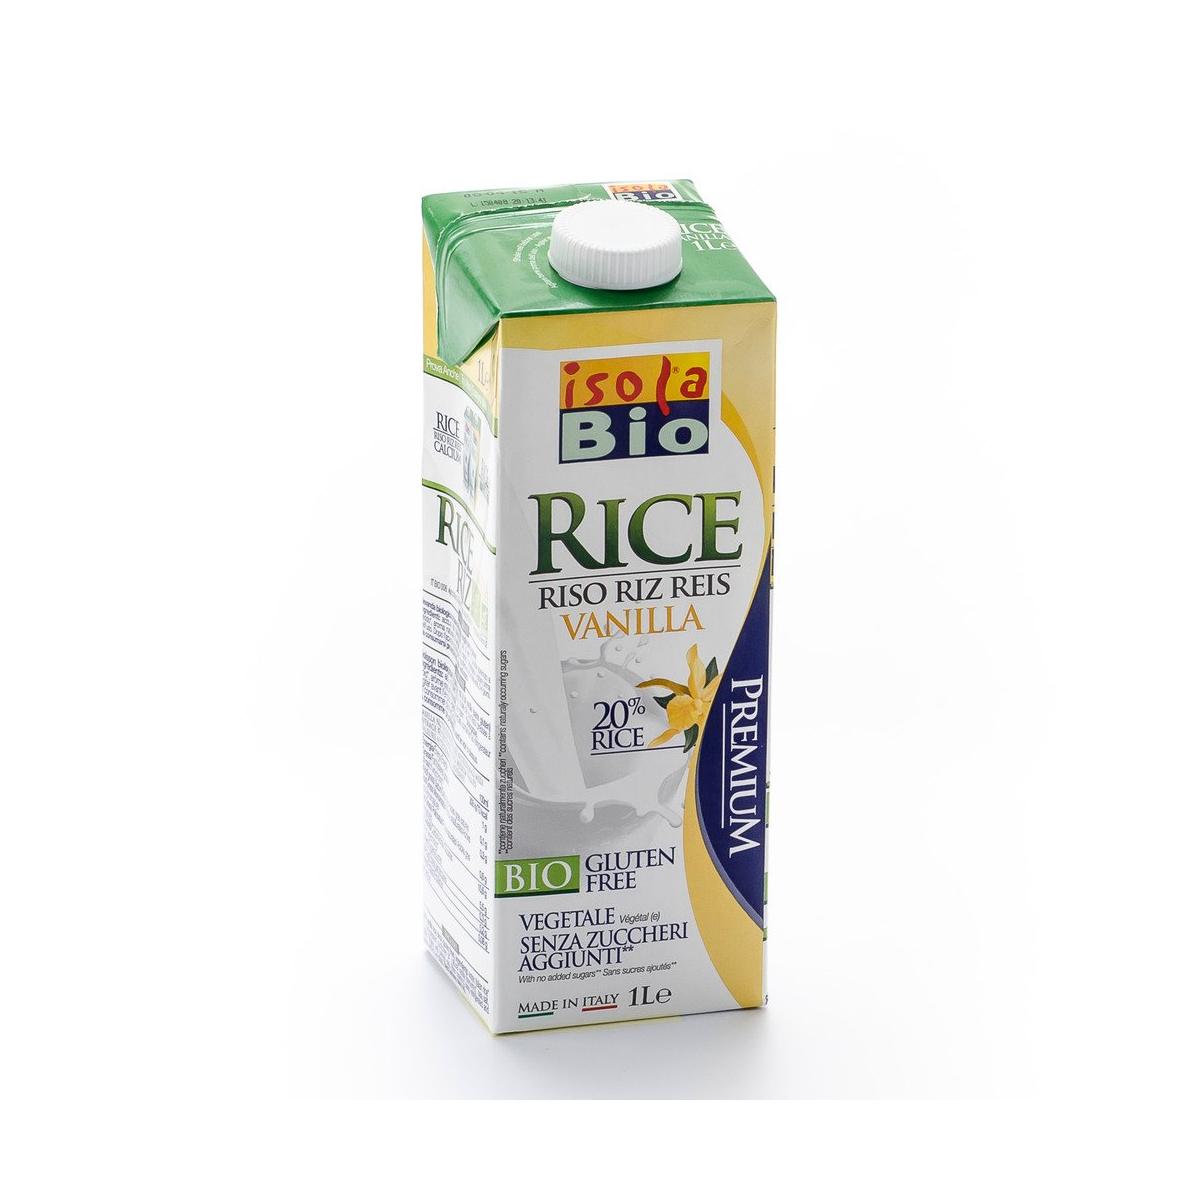 Reis Drink Vanille Tetrapak 1 l - Isola Bio